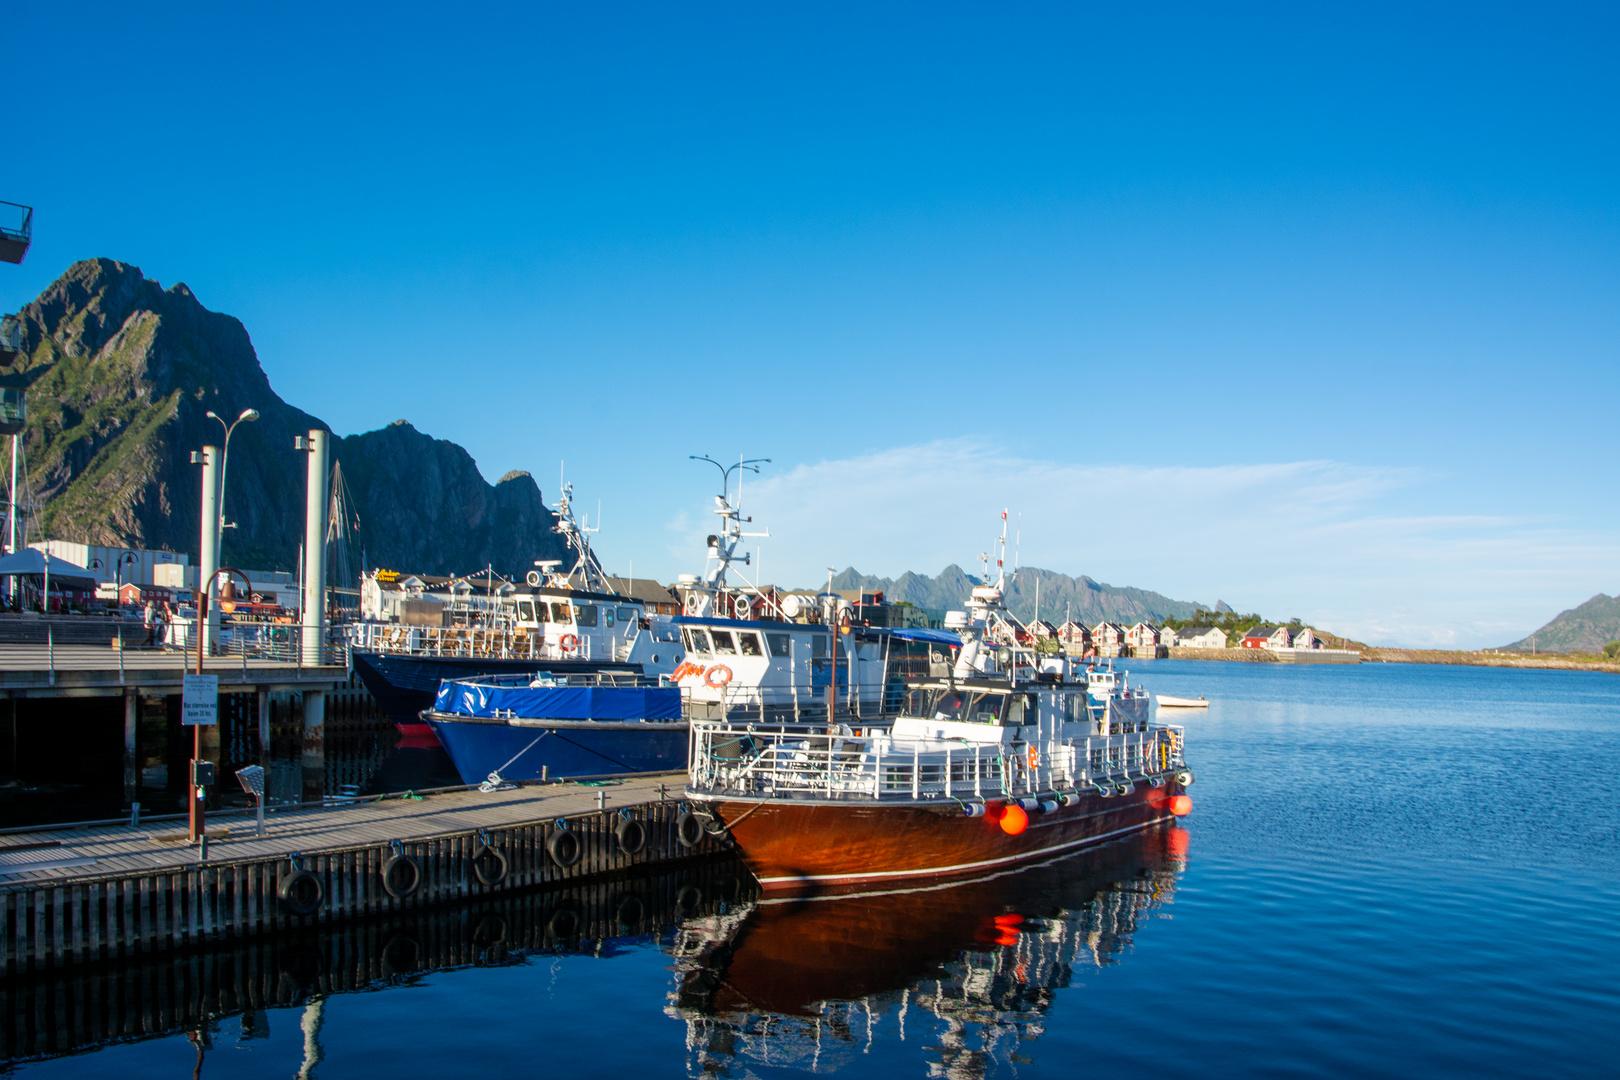 Hafen in Svolvær